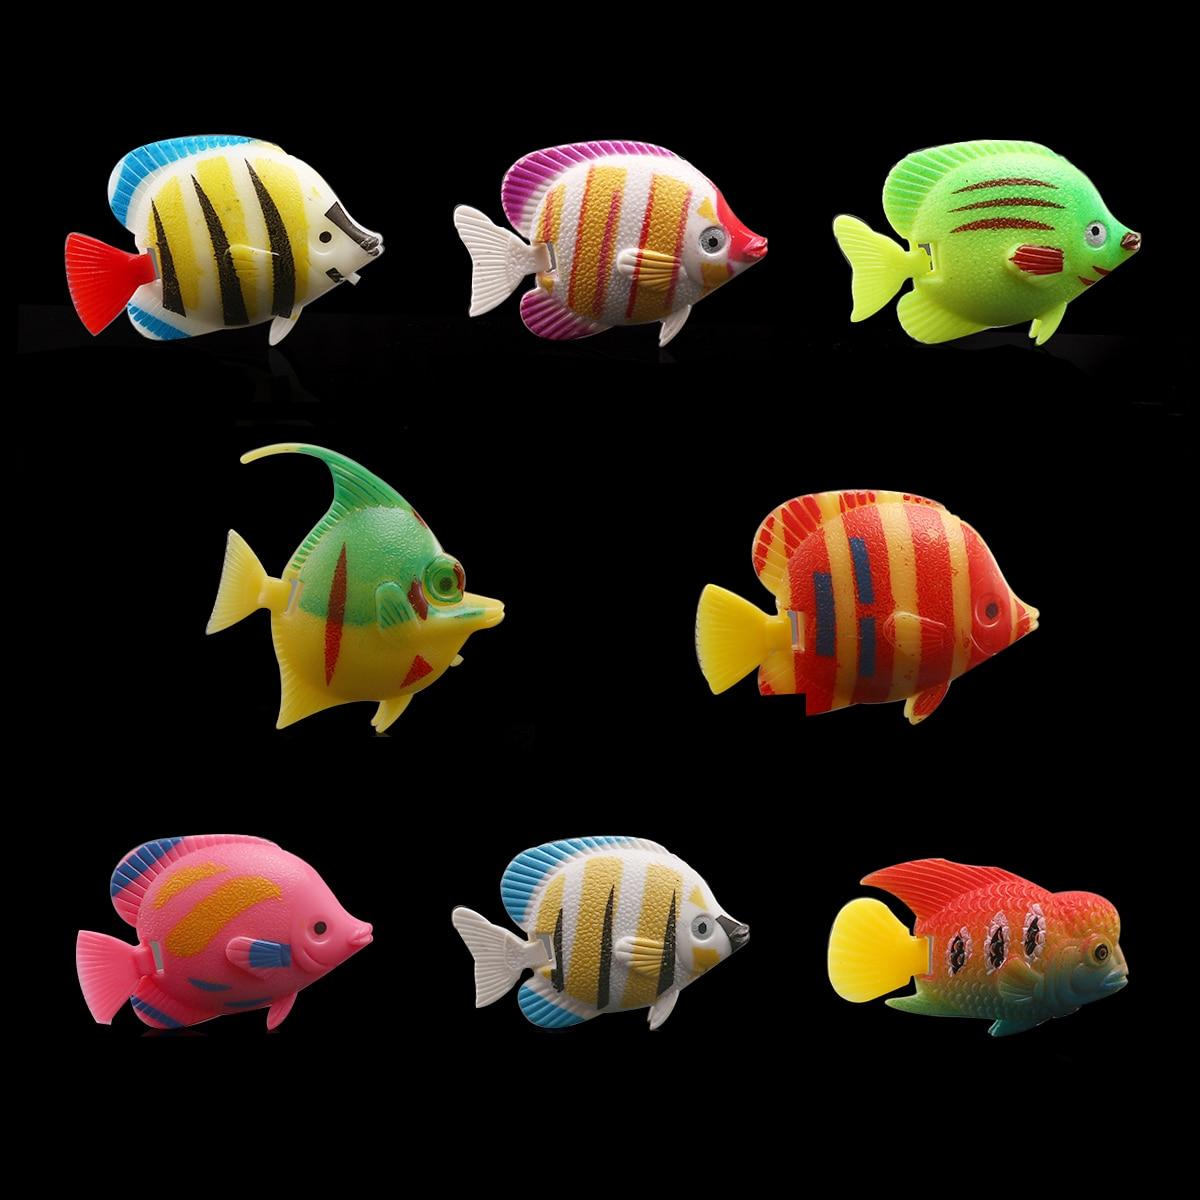 Fish tank dimensions - 10pcs Lifelike Plastic Artificial Moving Floating Fishes Ornament Decorations For Aquarium Fish Tank Random Color